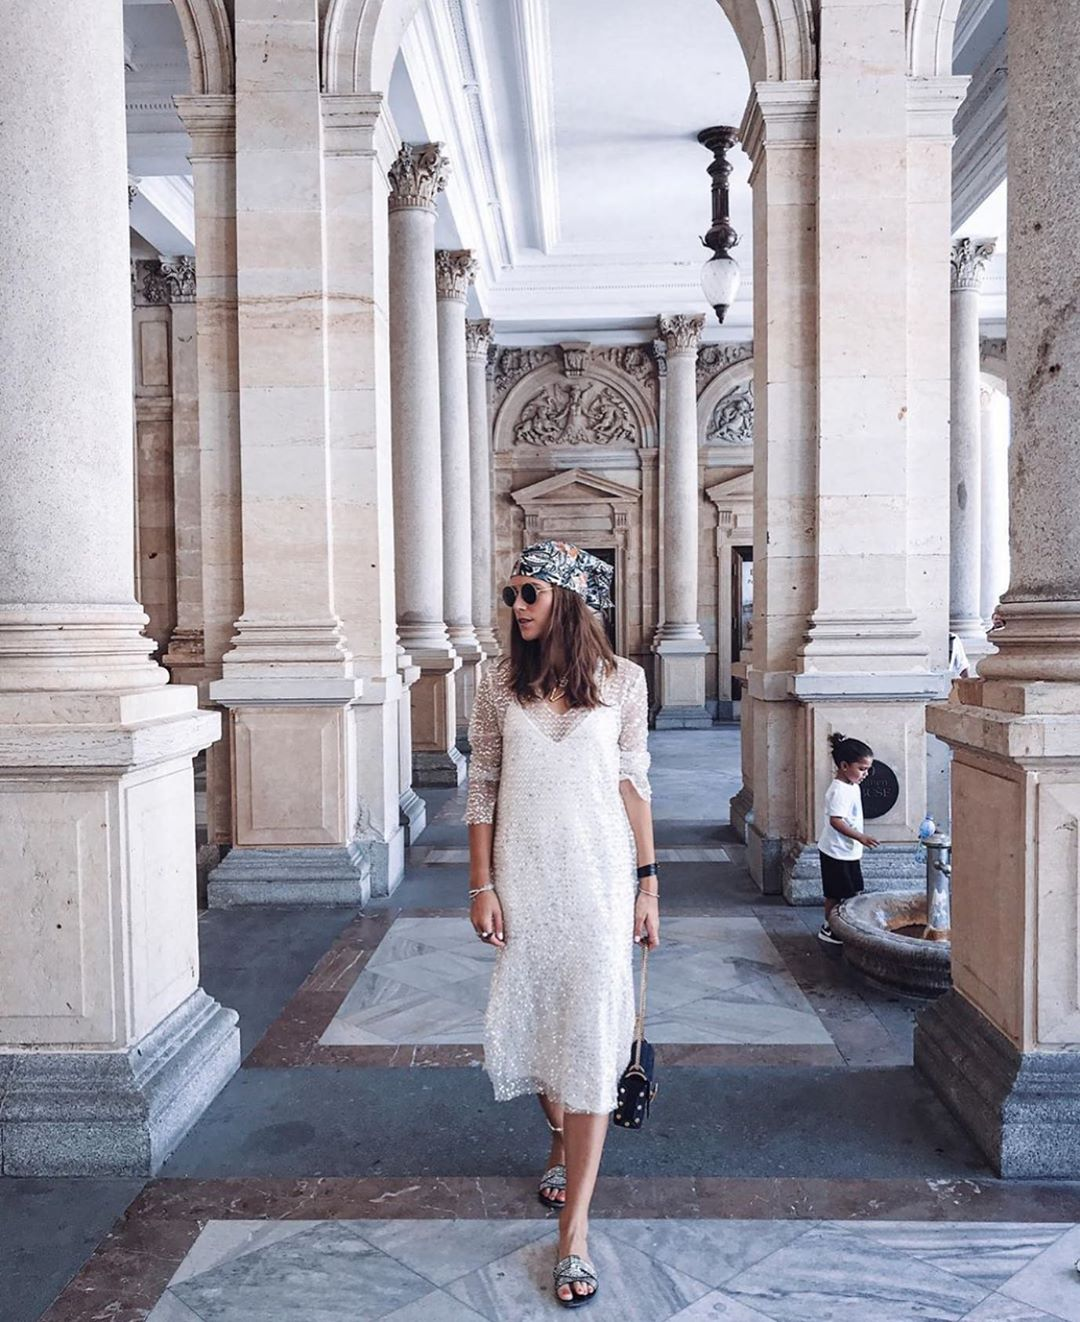 robe à paillettes de Zara sur zara.mania